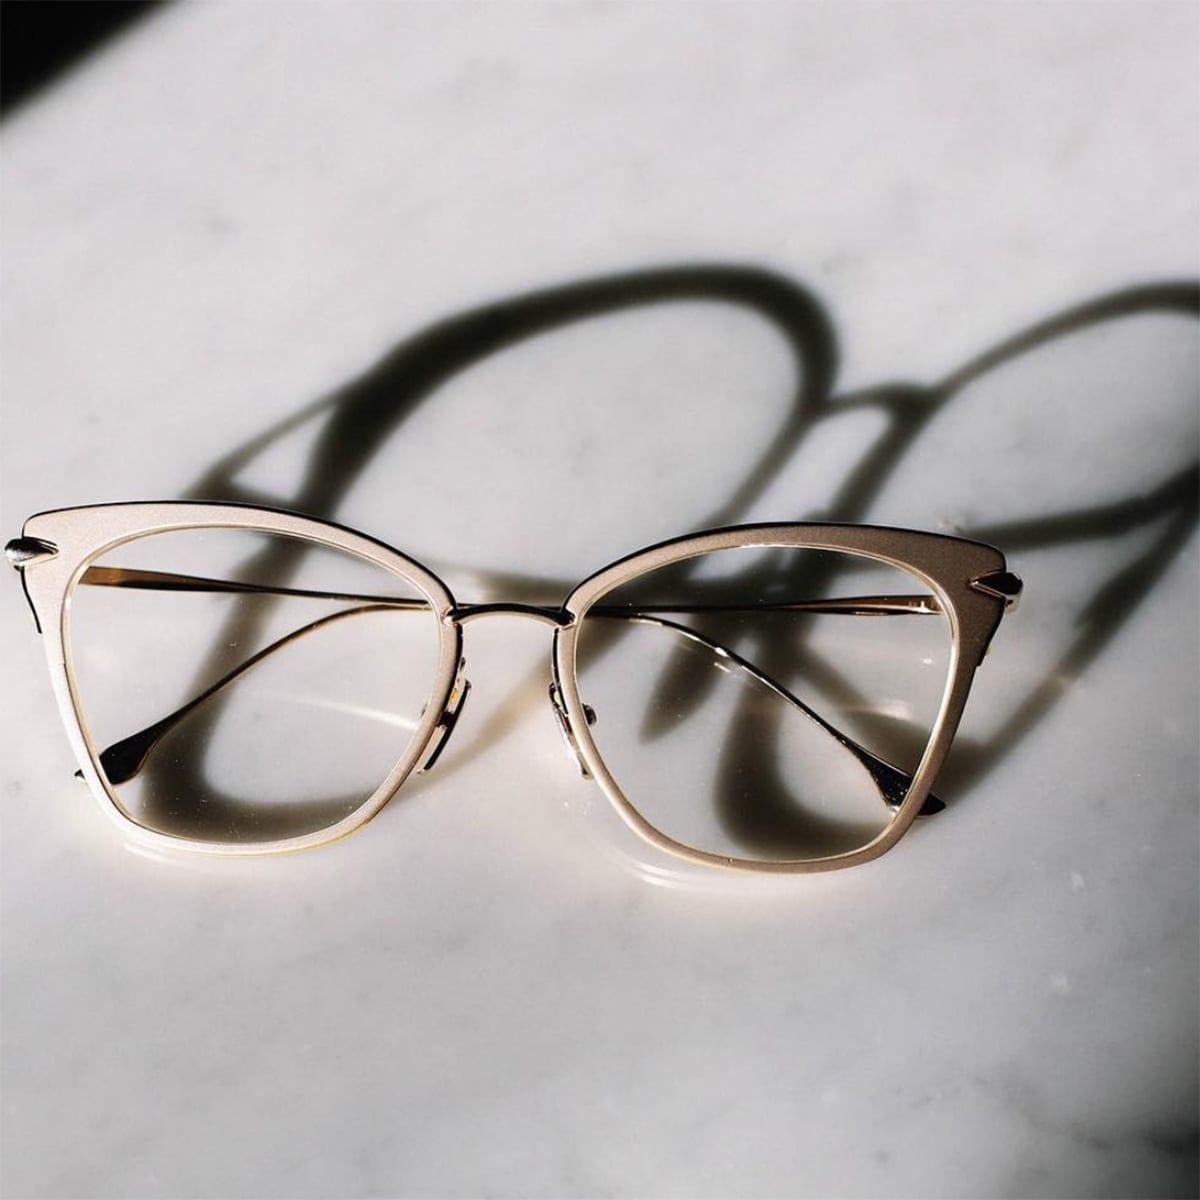 dita-eyewear-stockist-wolverhampton-shropshire-west-midlands-13